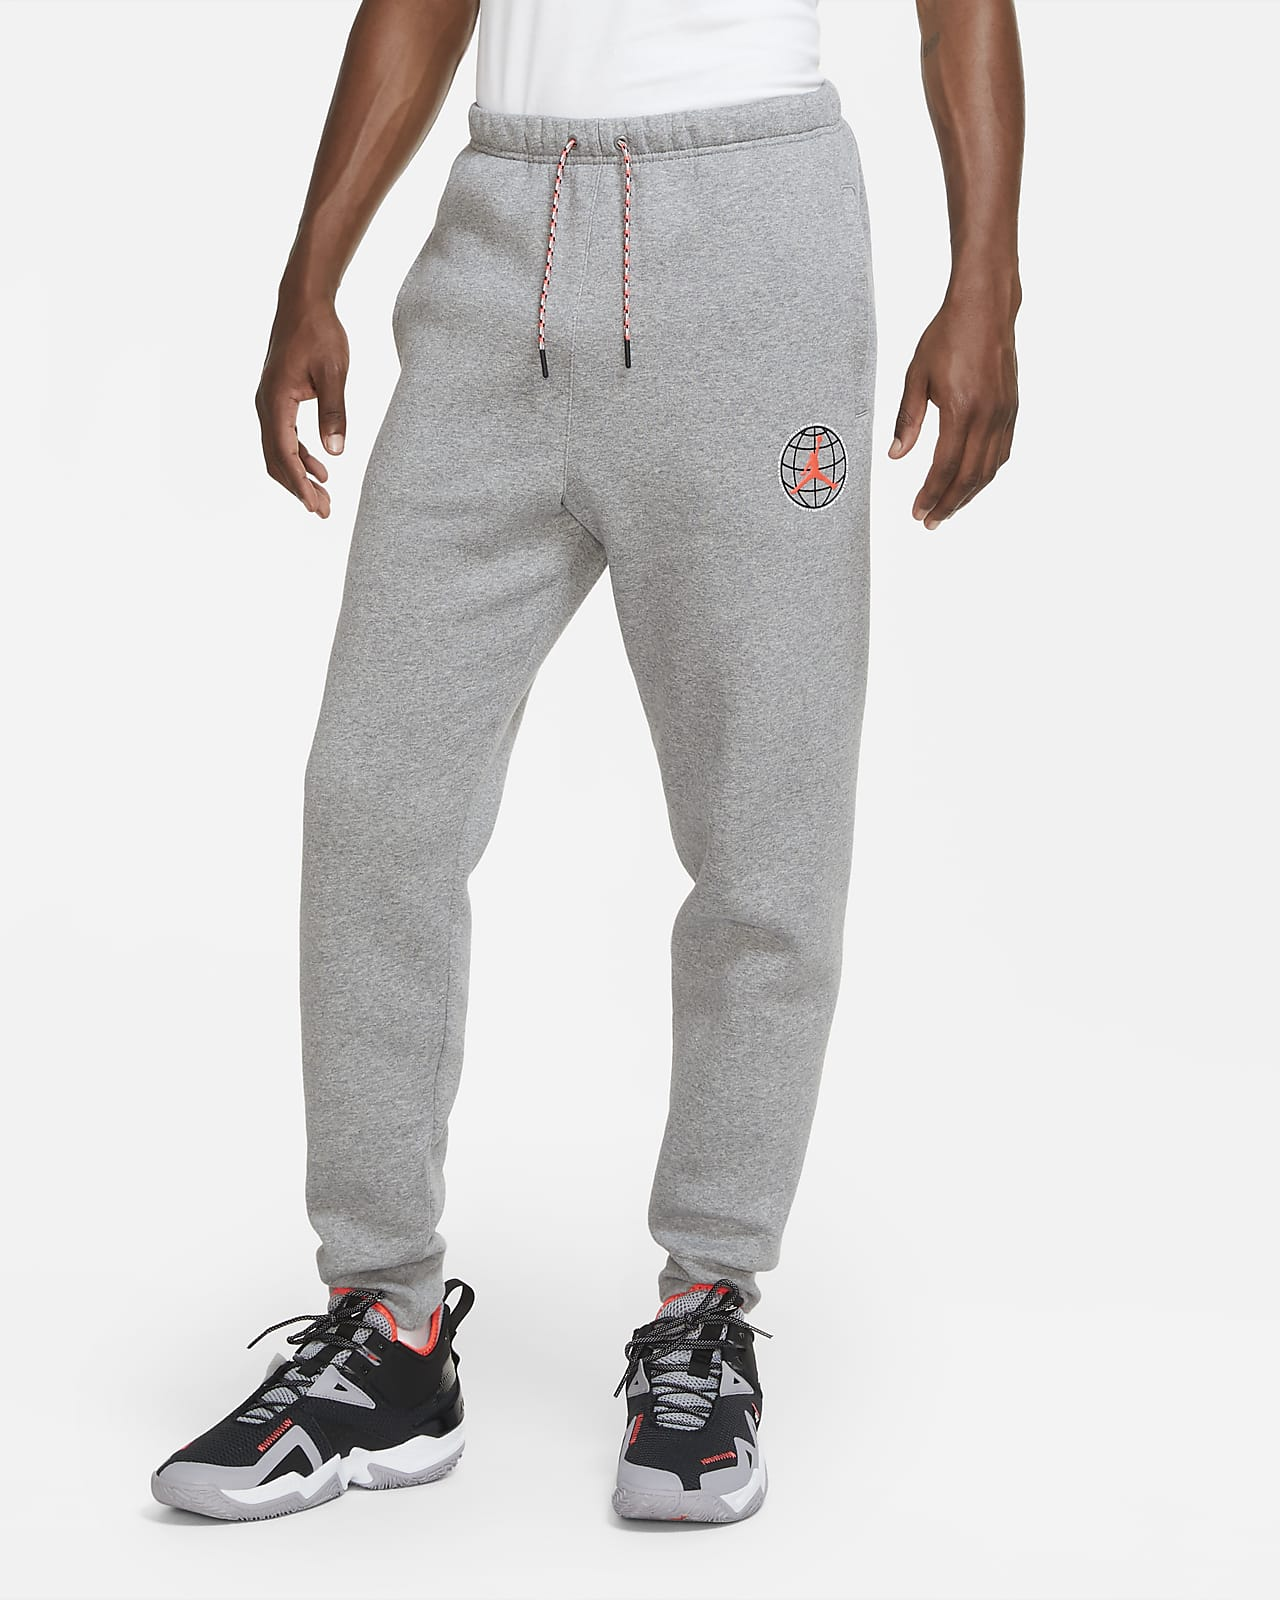 Jordan Winter Utility Men's Fleece Pants